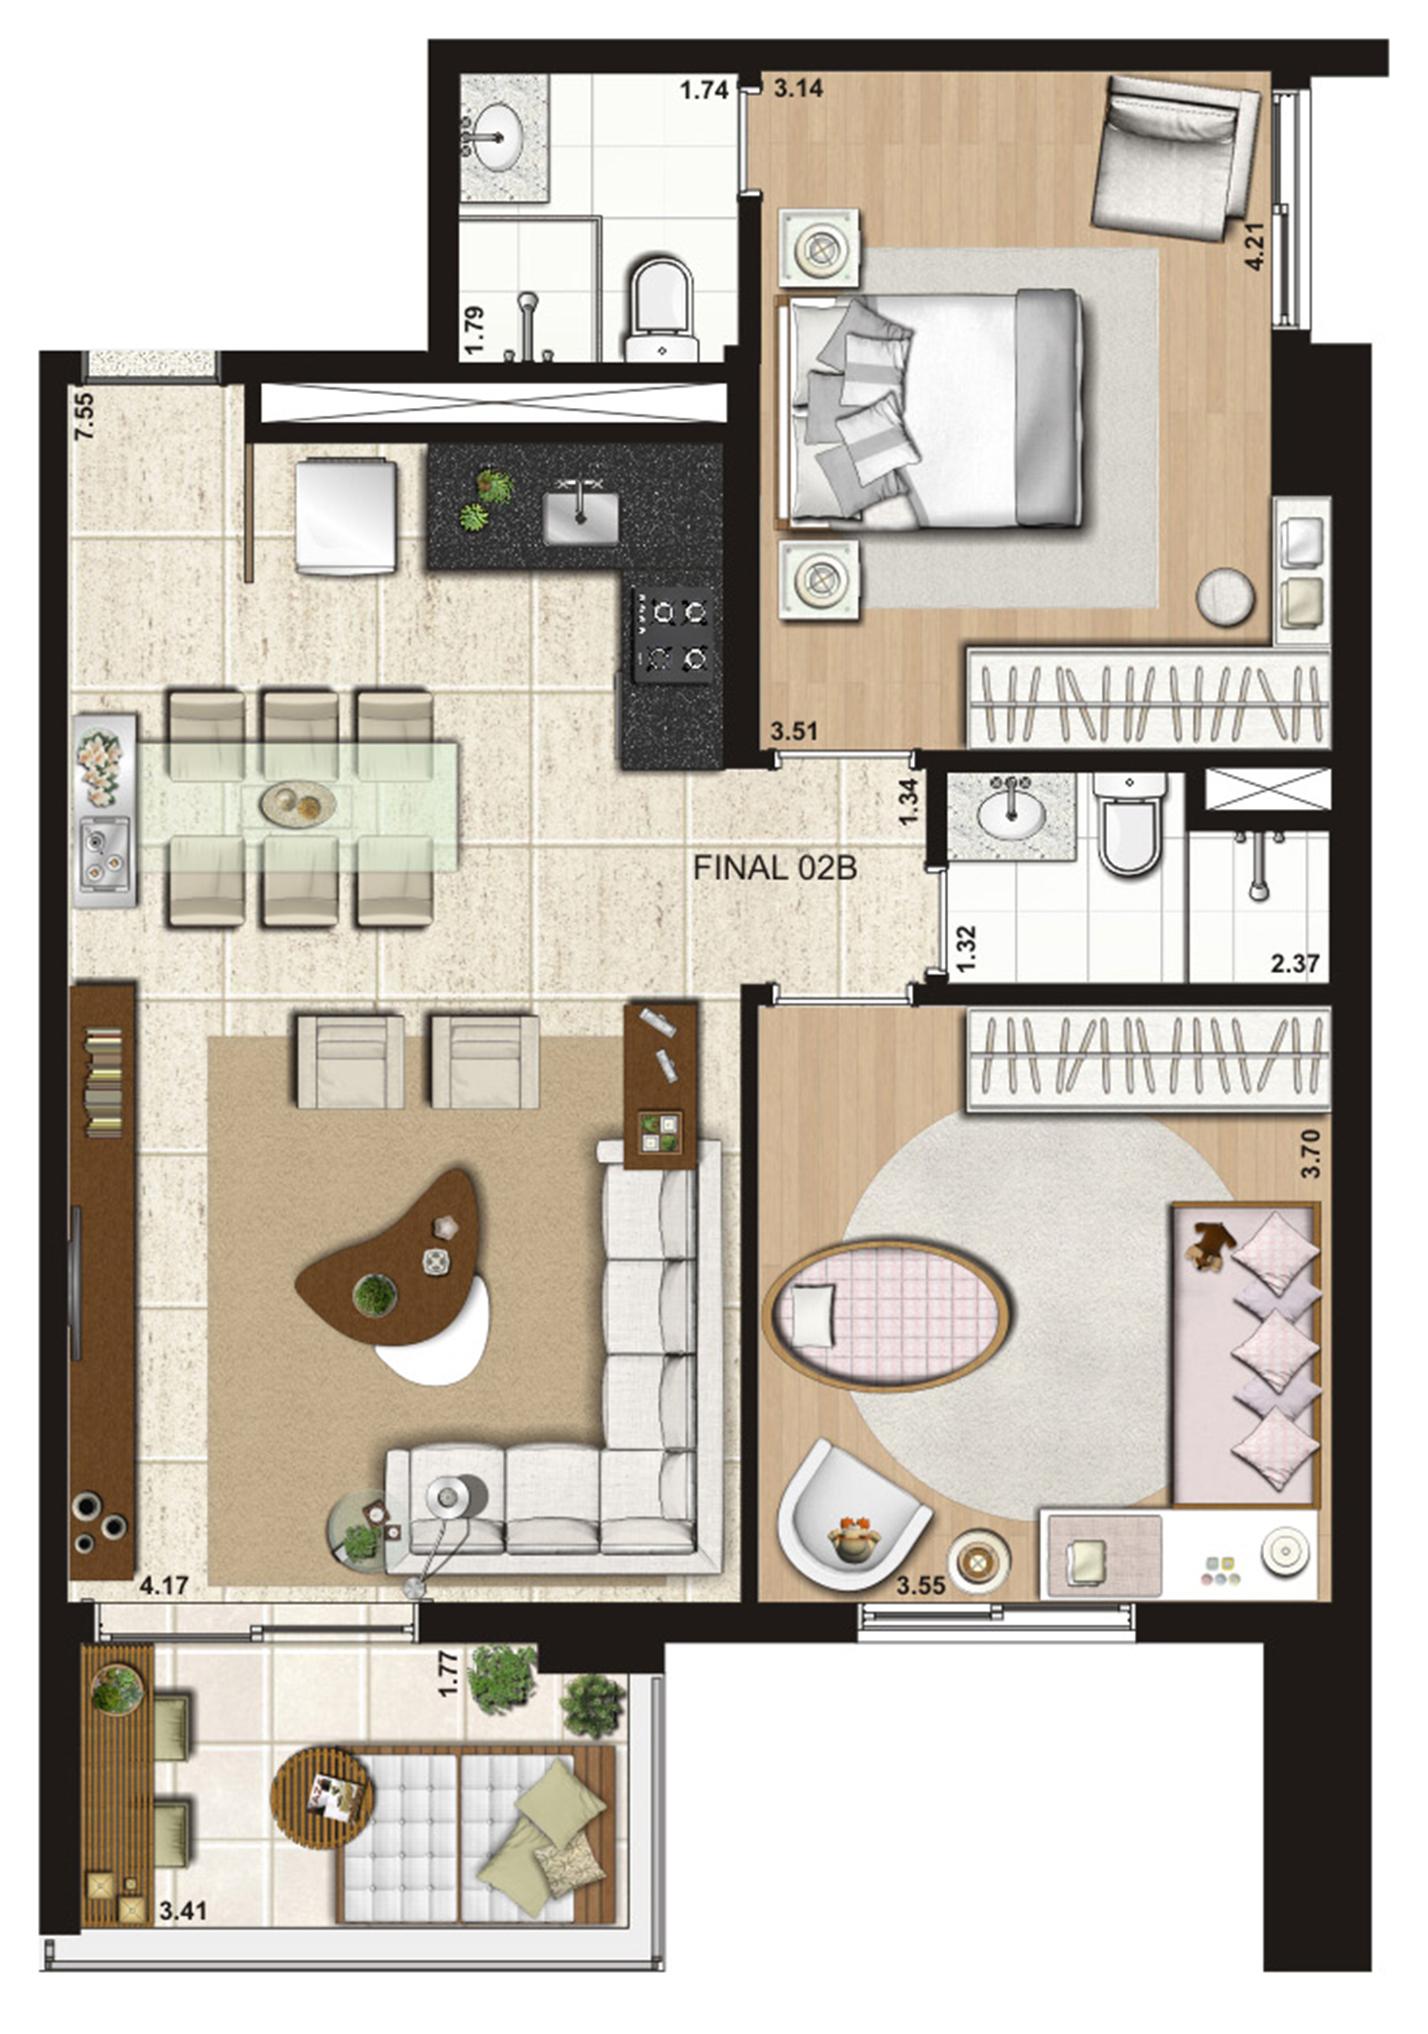 83 m² 2 dorms